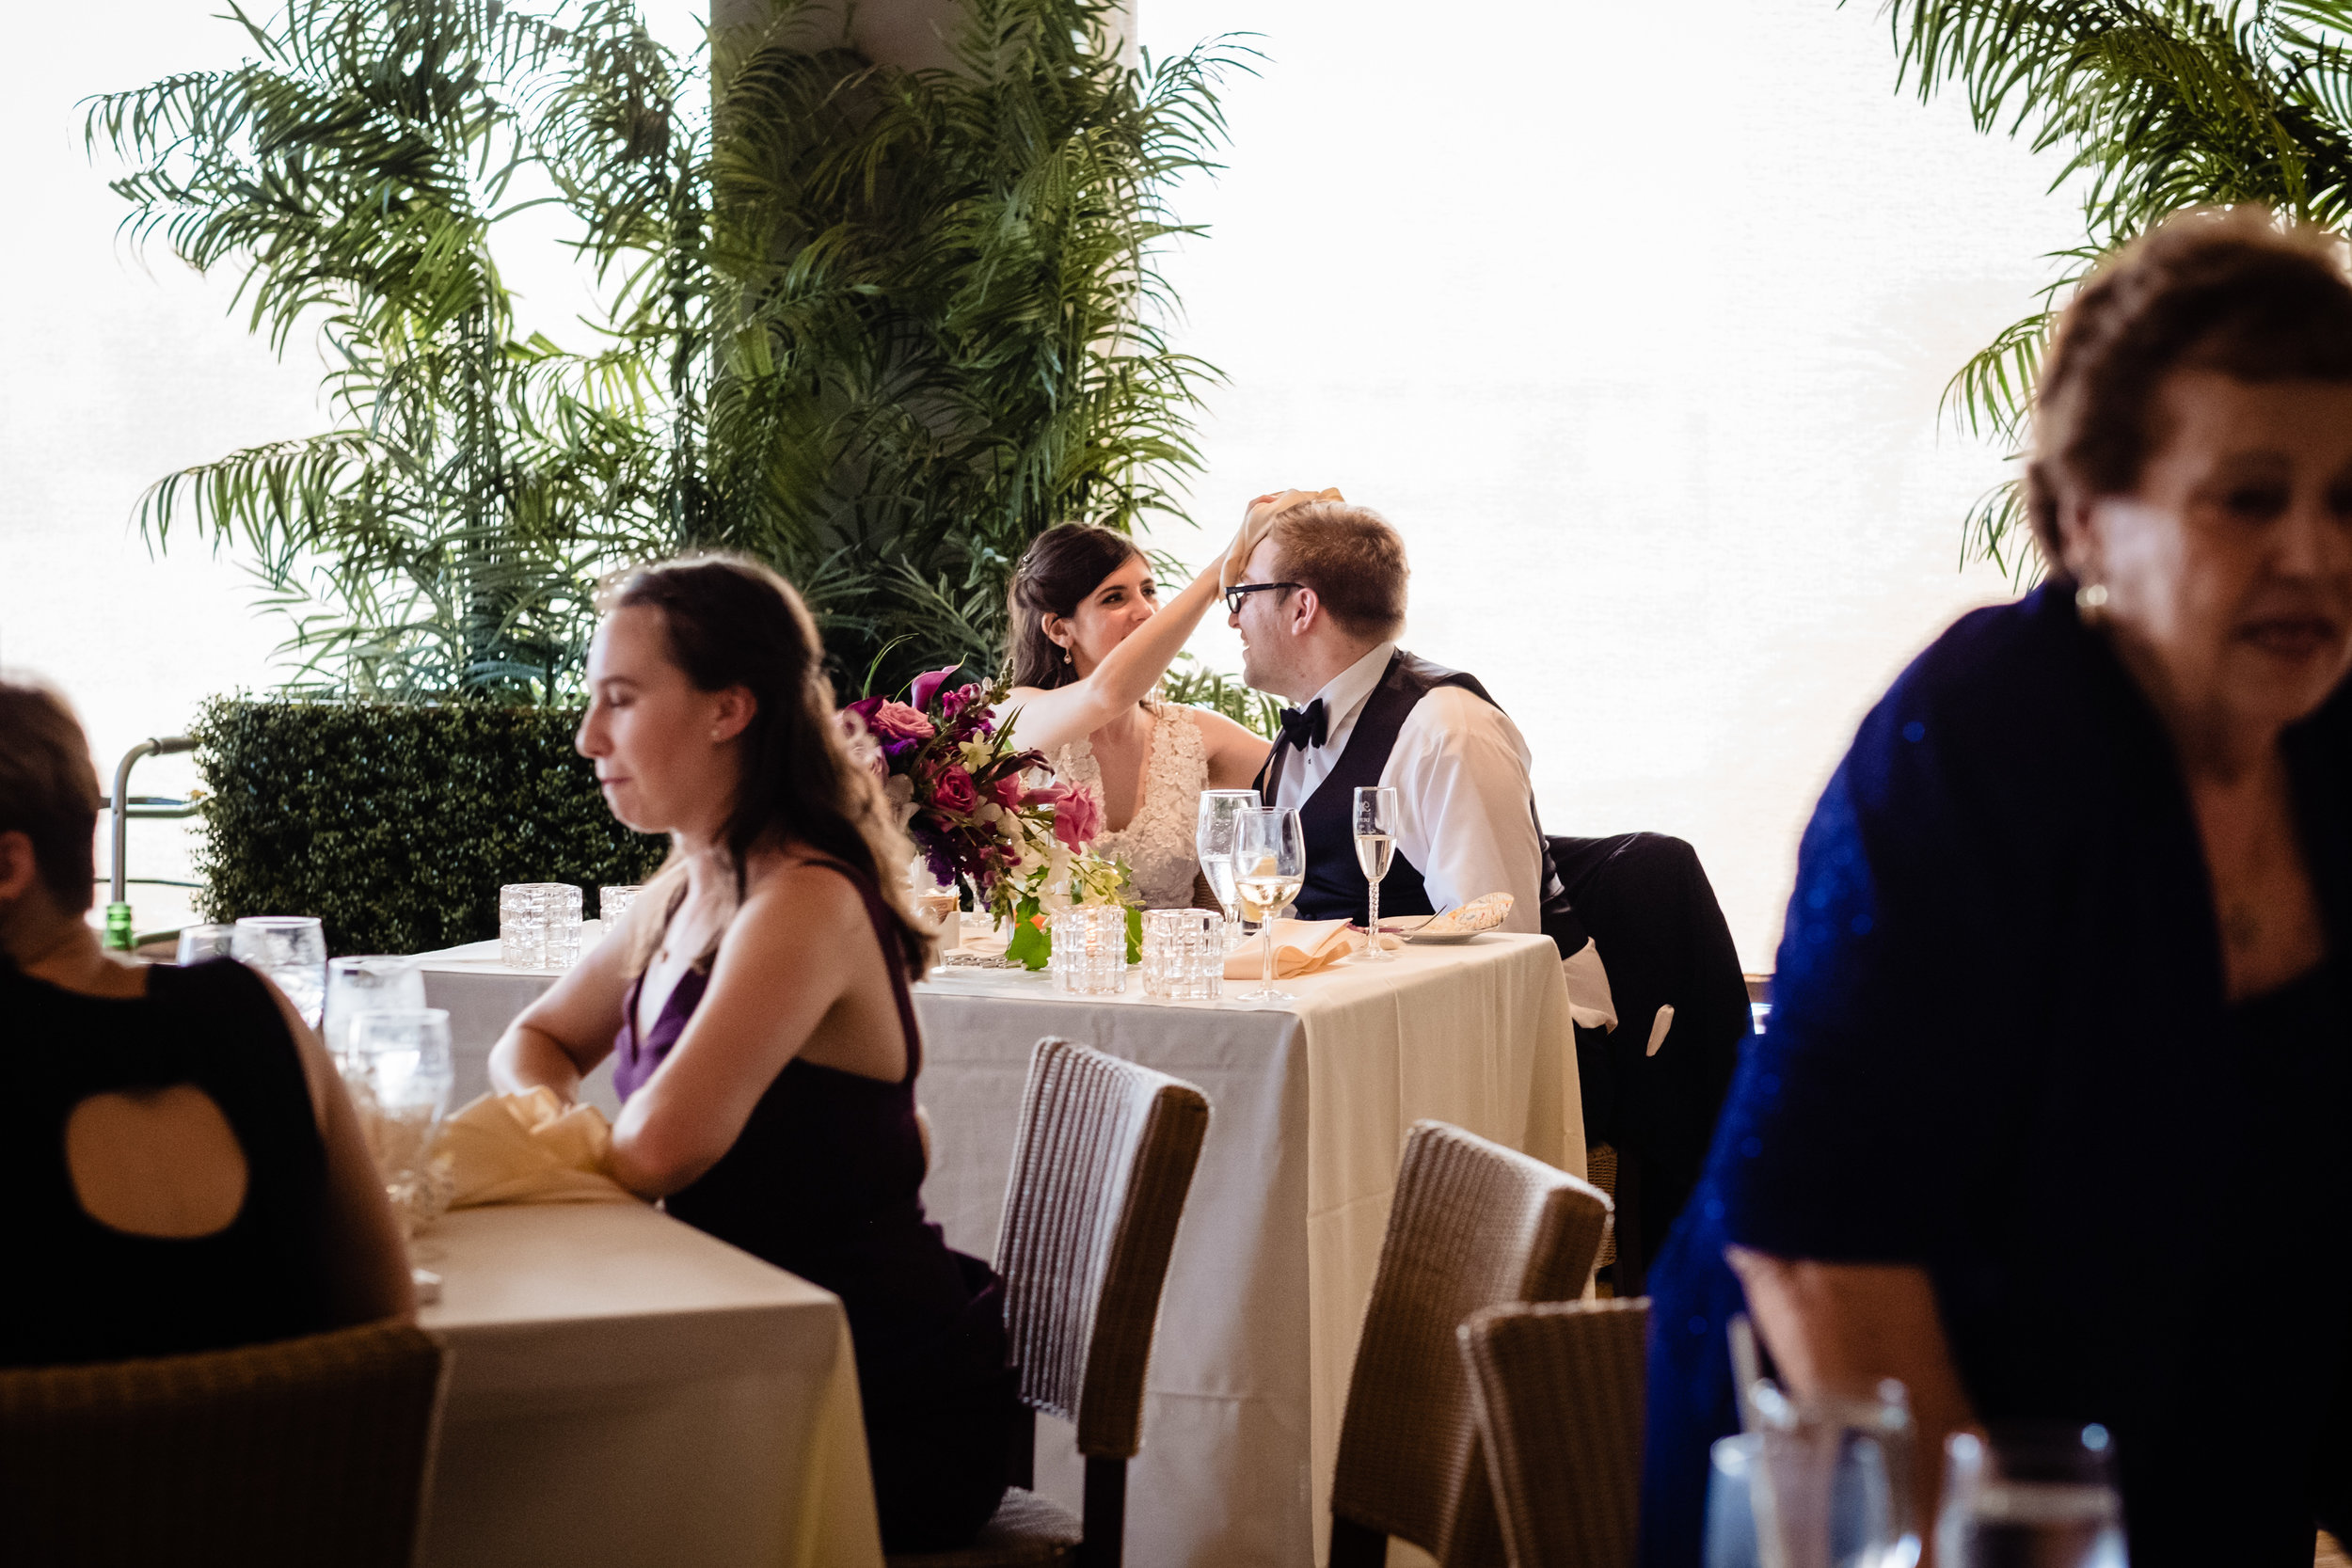 HAH_Zoe and Daniel_Clearwater Wedding_705_2018.jpg